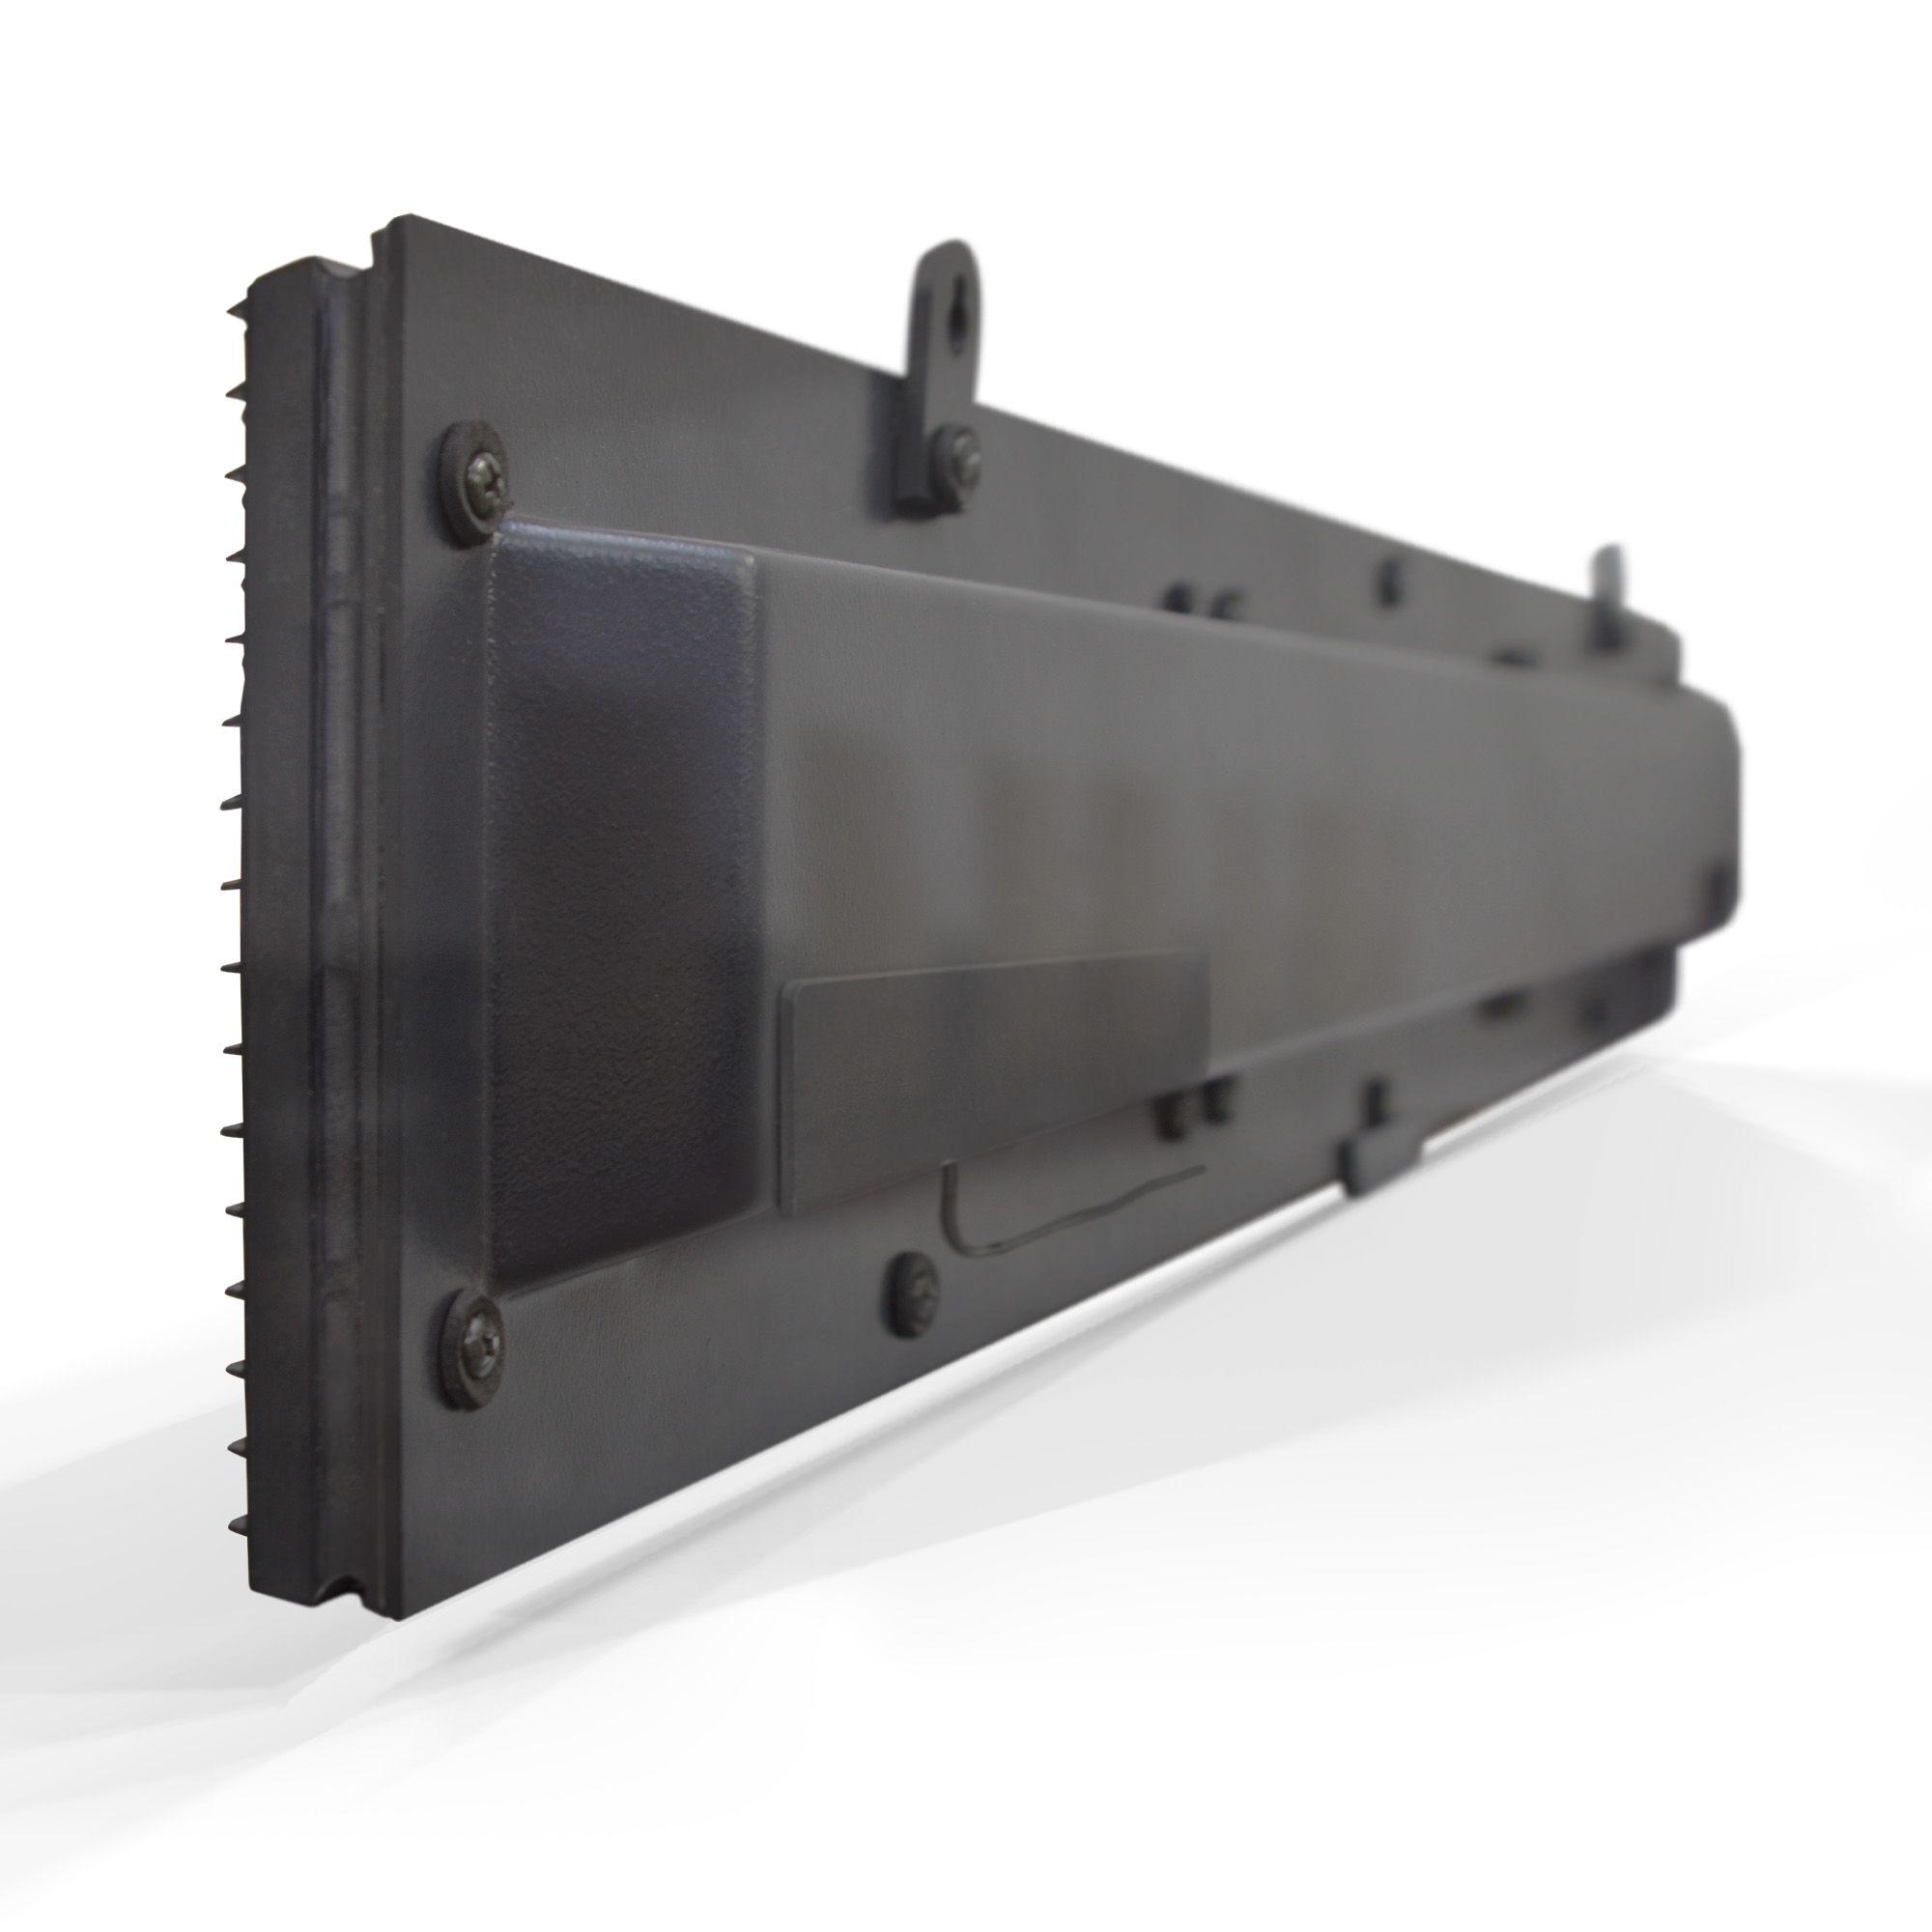 Painel de Mensagens LED Full M3E (Externo) - 96x16 cm